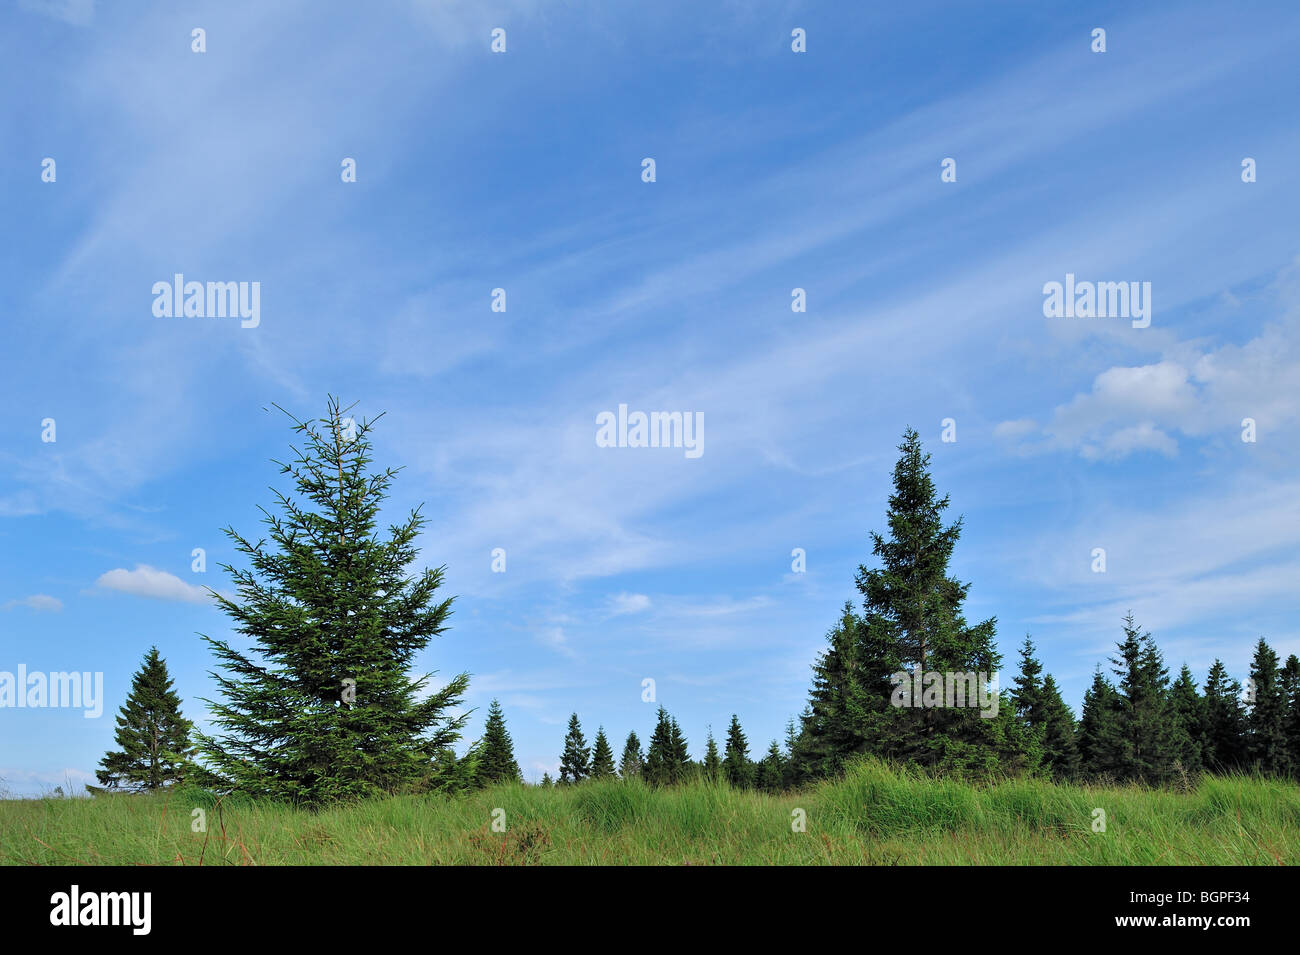 Spruce trees in the High Fens / Hautes Fagnes, Belgian Ardennes, Belgium - Stock Image